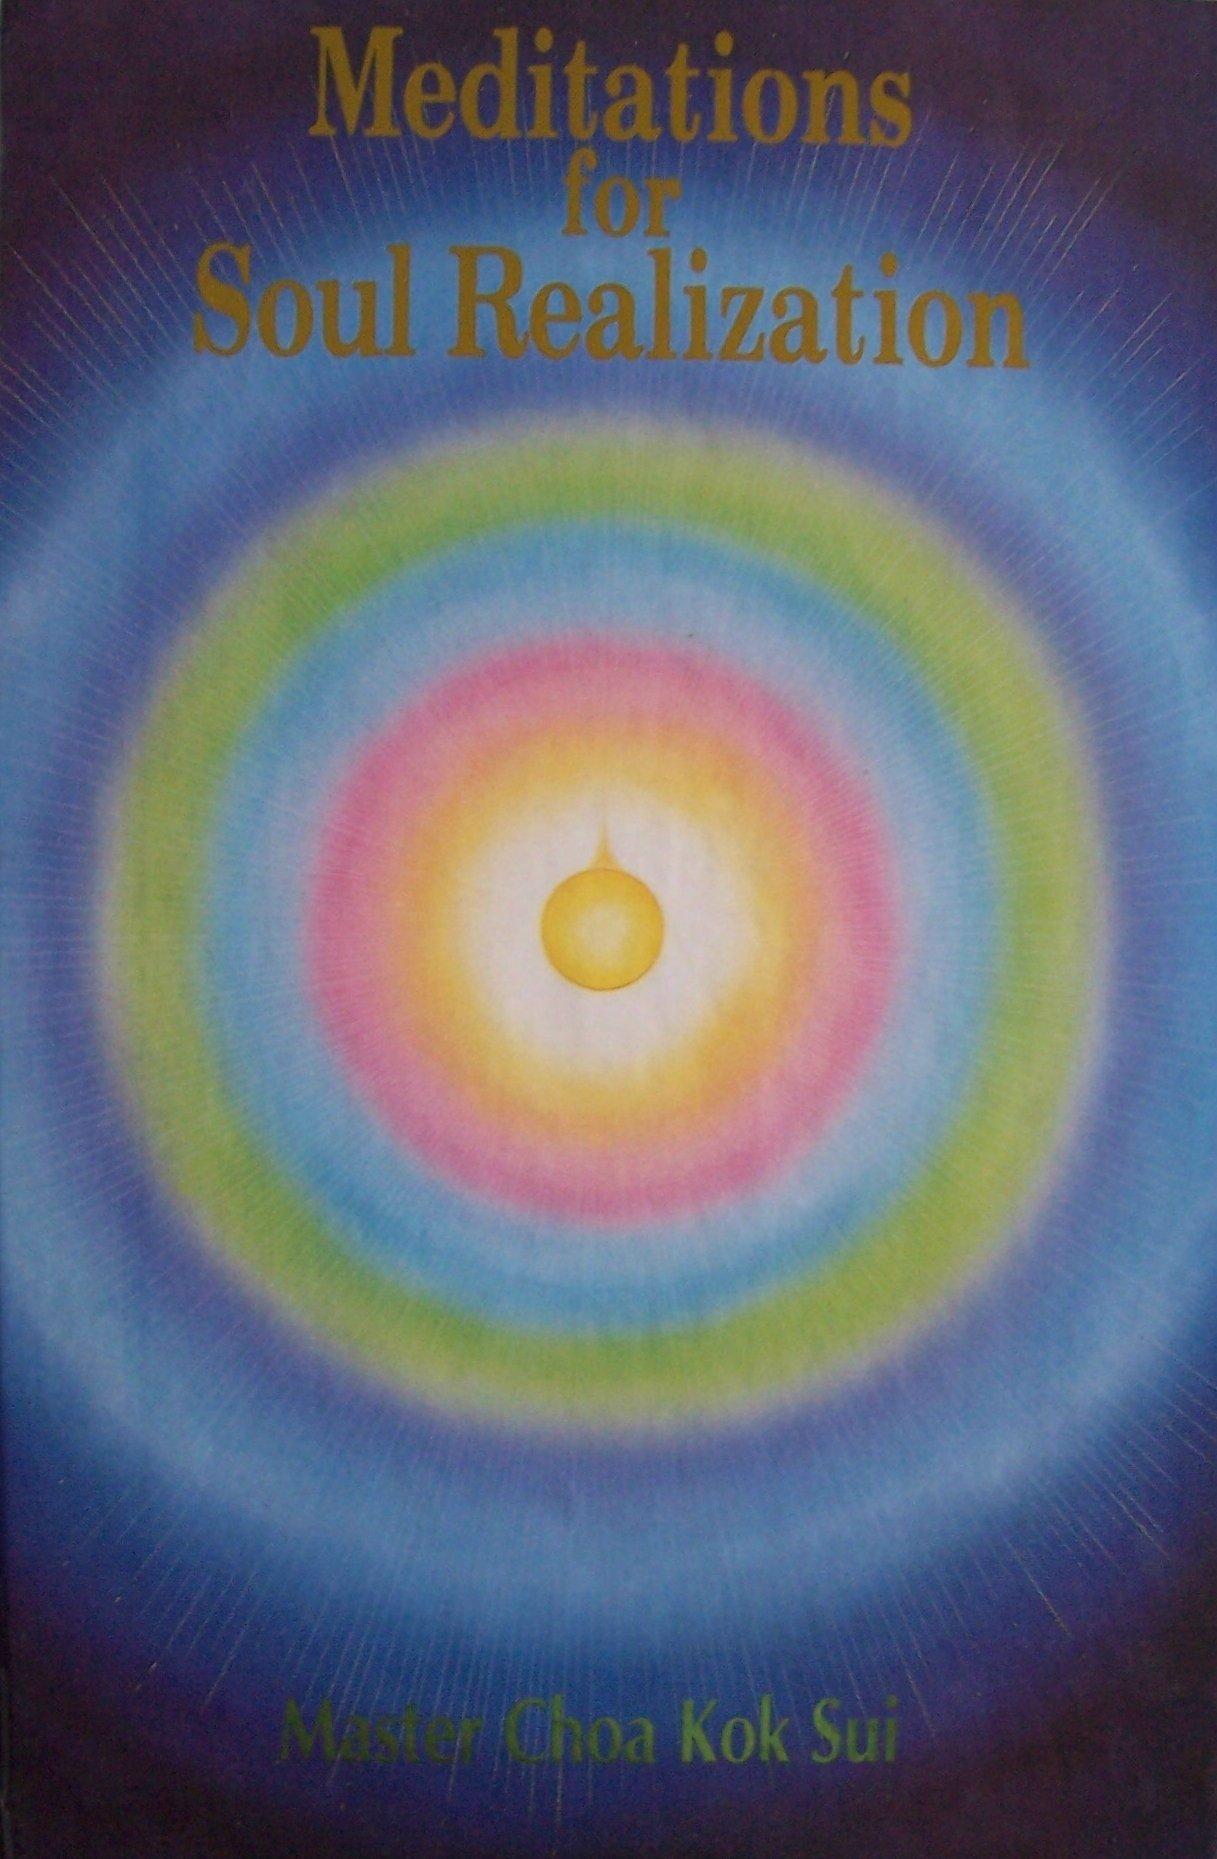 Download Meditations for Soul Realization [ Master Choa Kok Sui ] (Meditation on Twin Hearts for Peace and Illumination, Meditation on the Soul; Raja Yoga) pdf epub